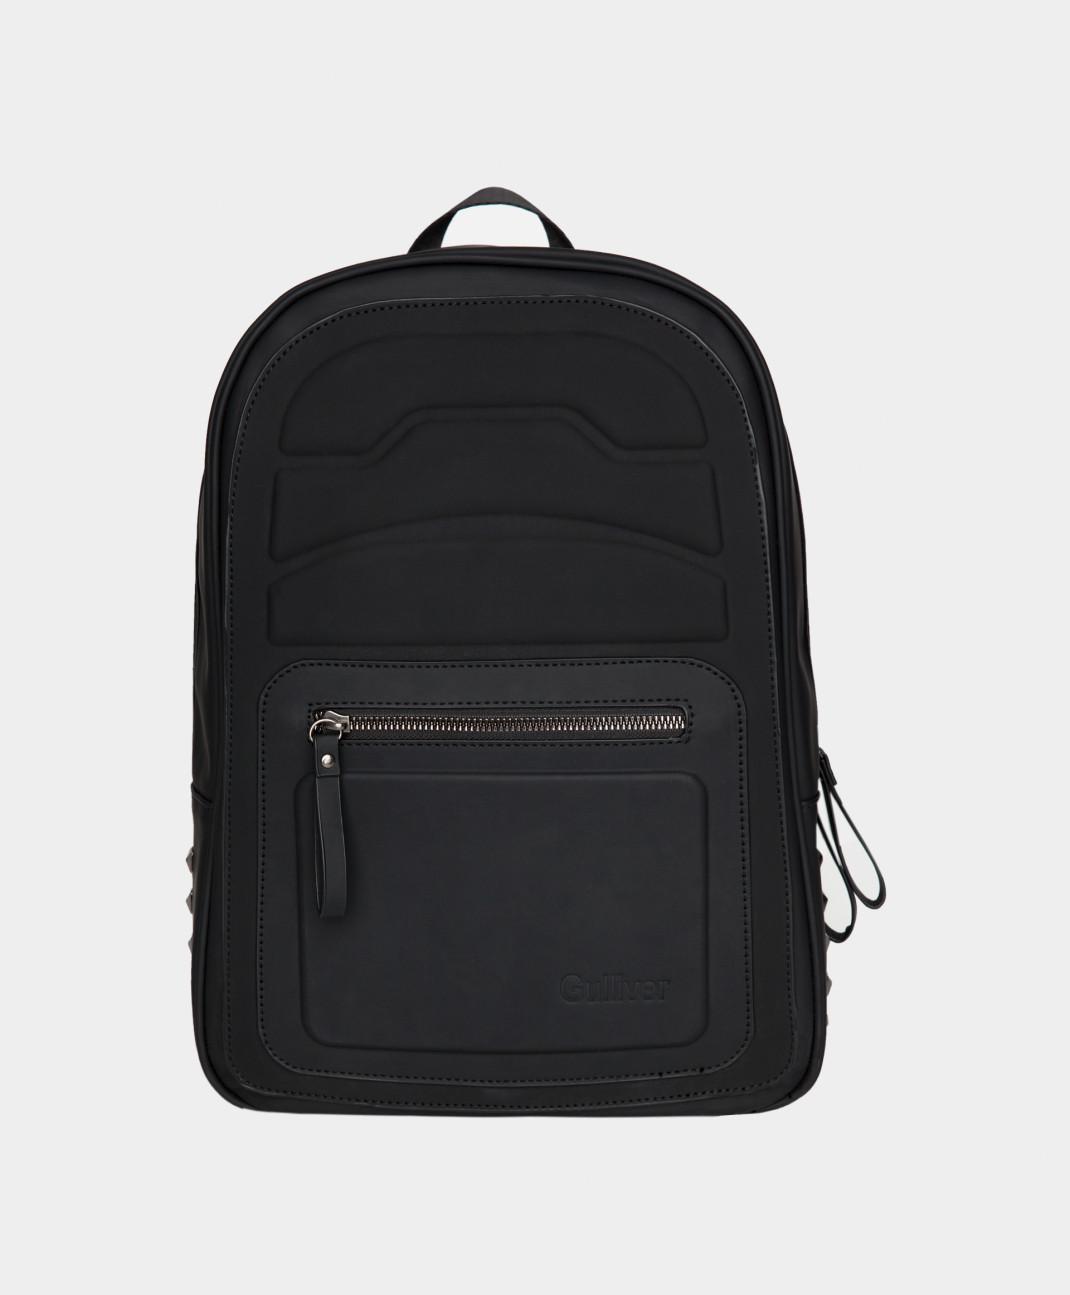 Gulliver Черный рюкзак для мальчика Gulliver